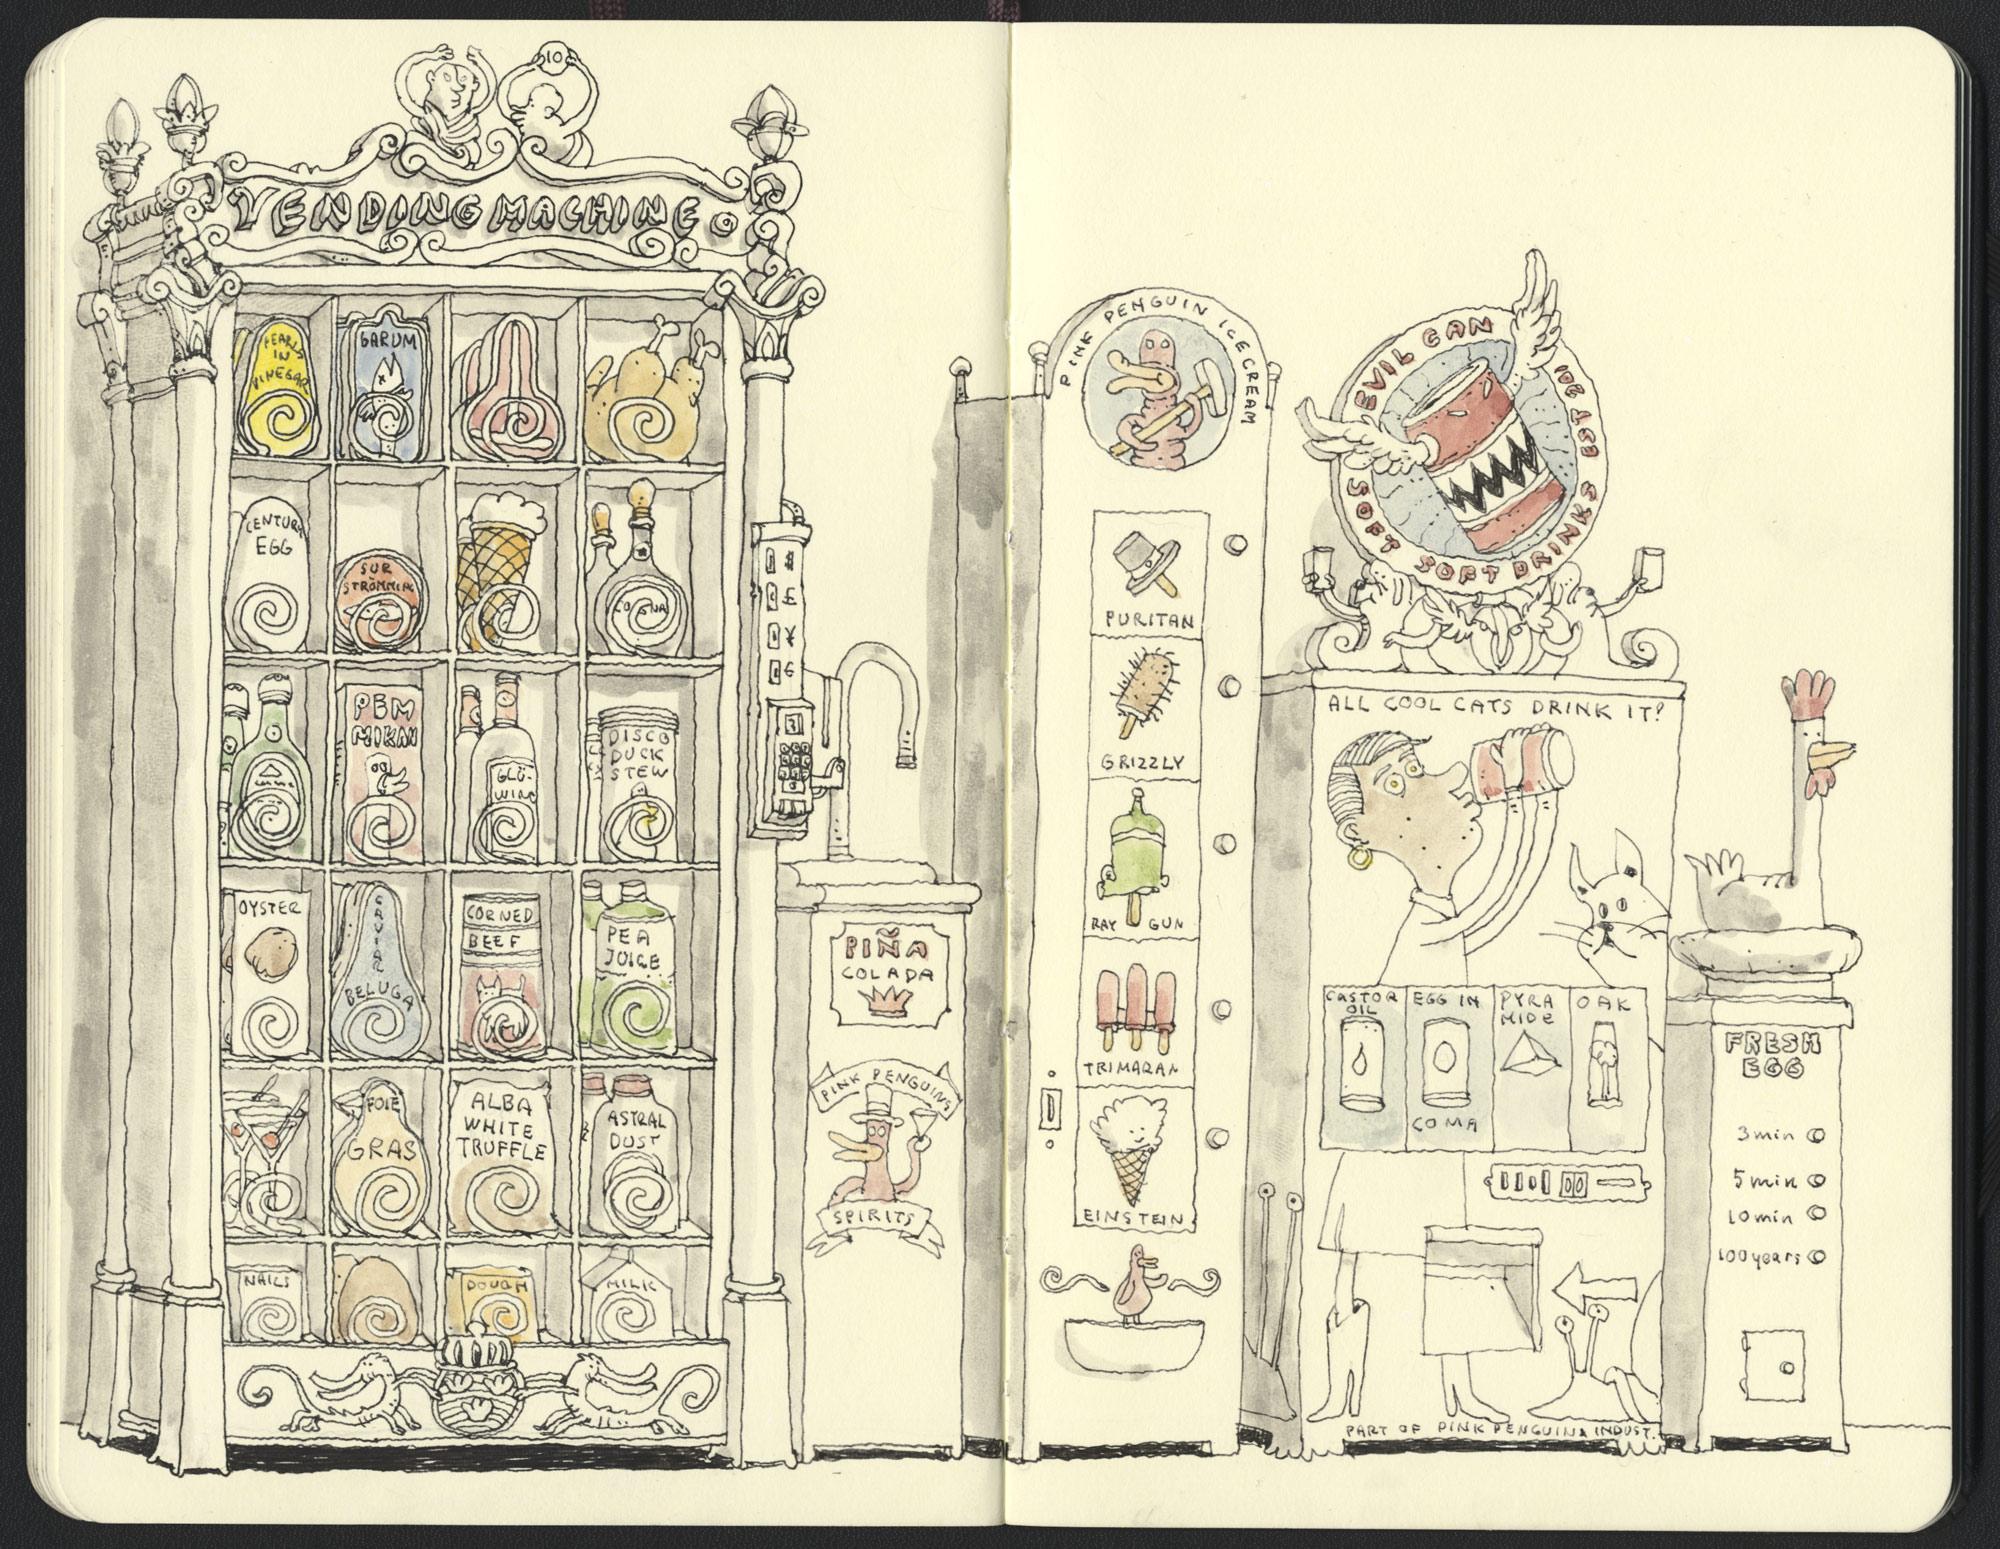 veni vending vici by MattiasA